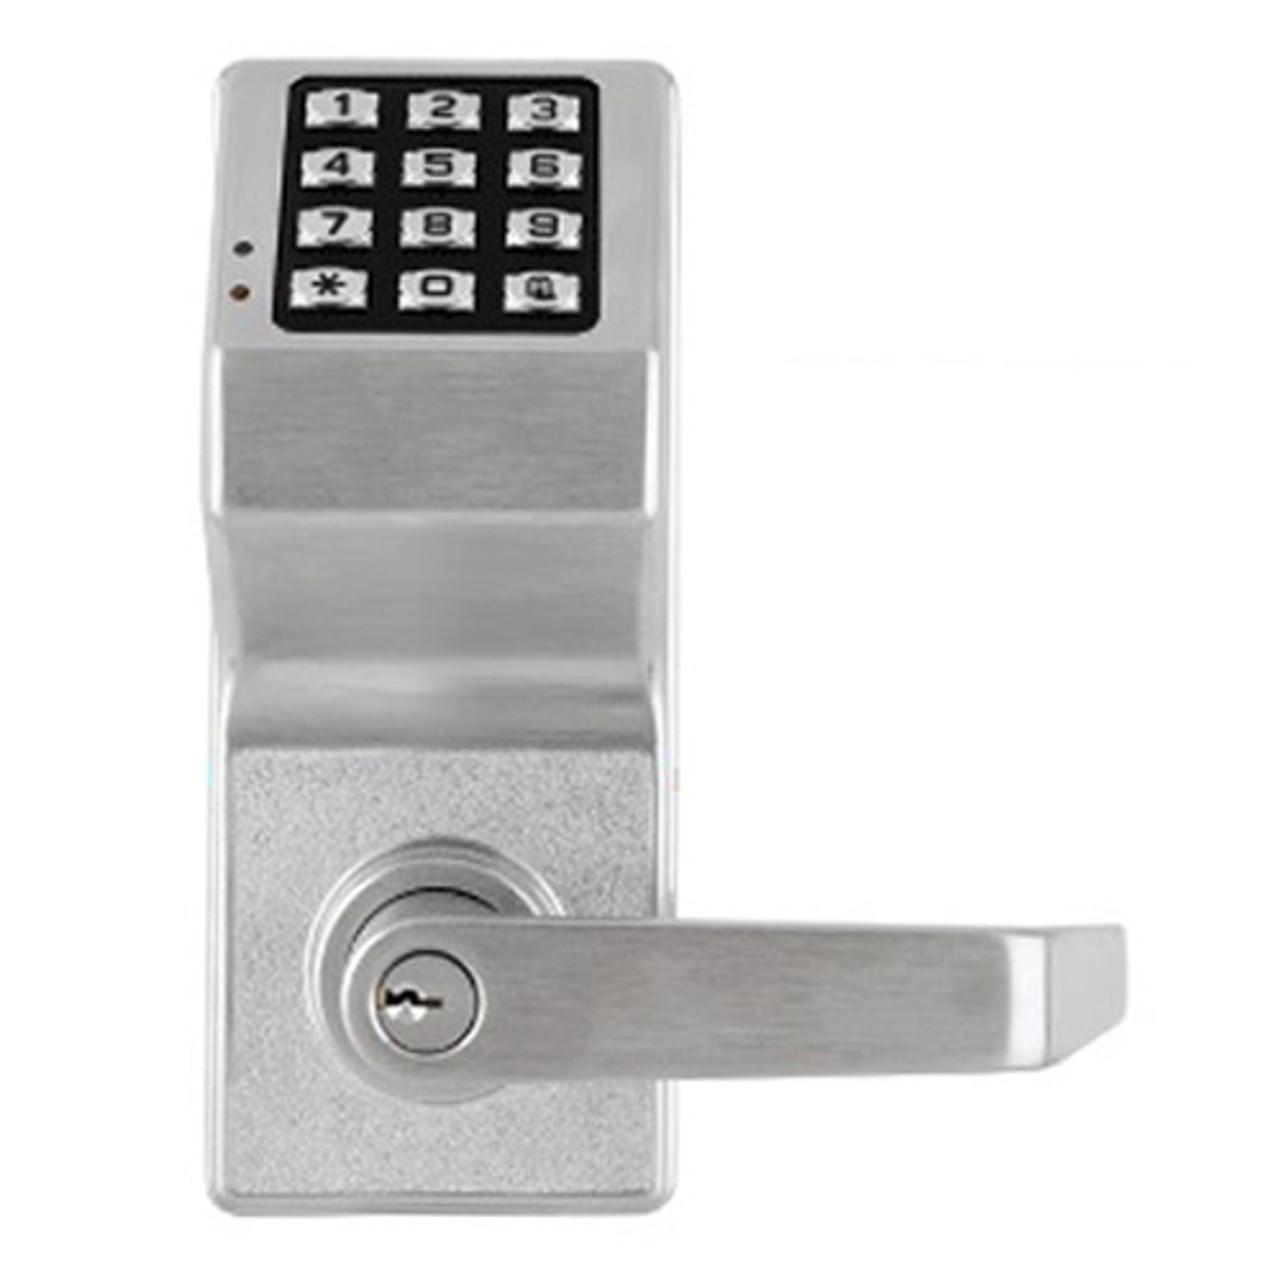 DL3200-US26D Alarm Lock Trilogy Electronic Digital Lock in Satin Chrome Finish